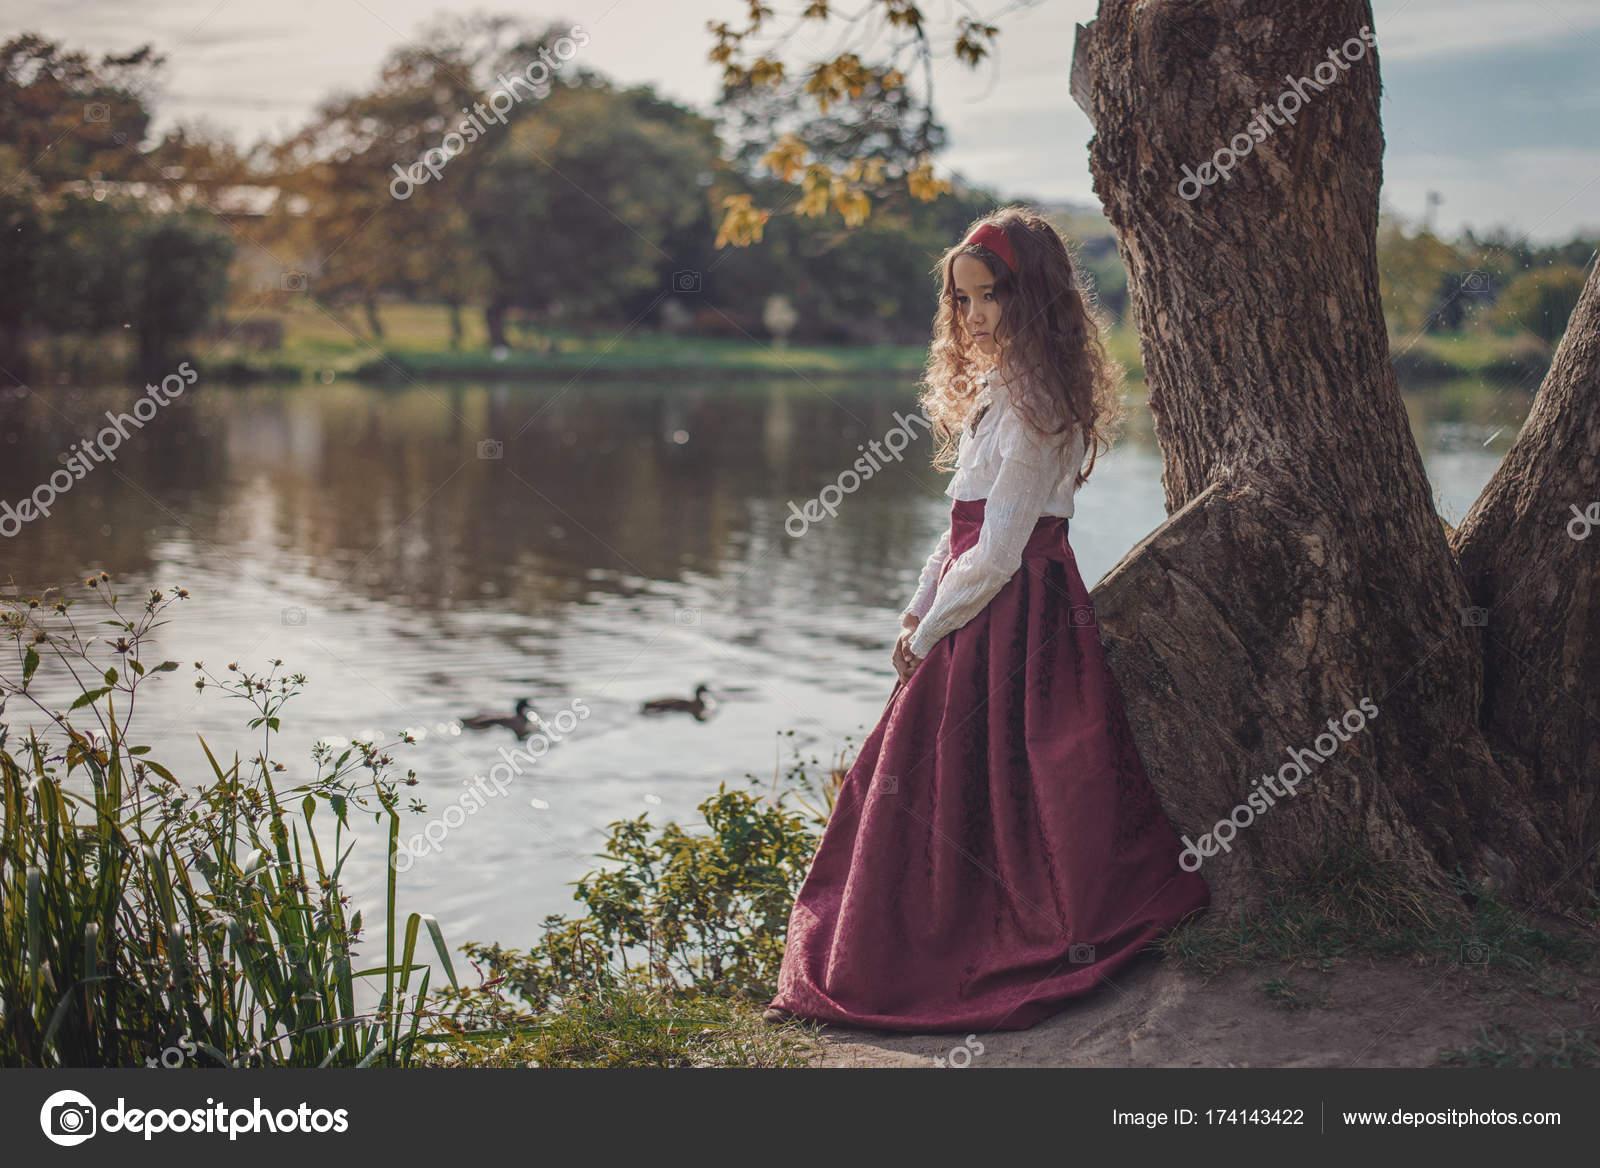 875886846b7 Χαριτωμένο μικρό κορίτσι Καυκάσιος φορώντας τα ρετρό ρούχα. Ωραίο θηλυκό  παιδί σε όμορφο vintage φόρεμα